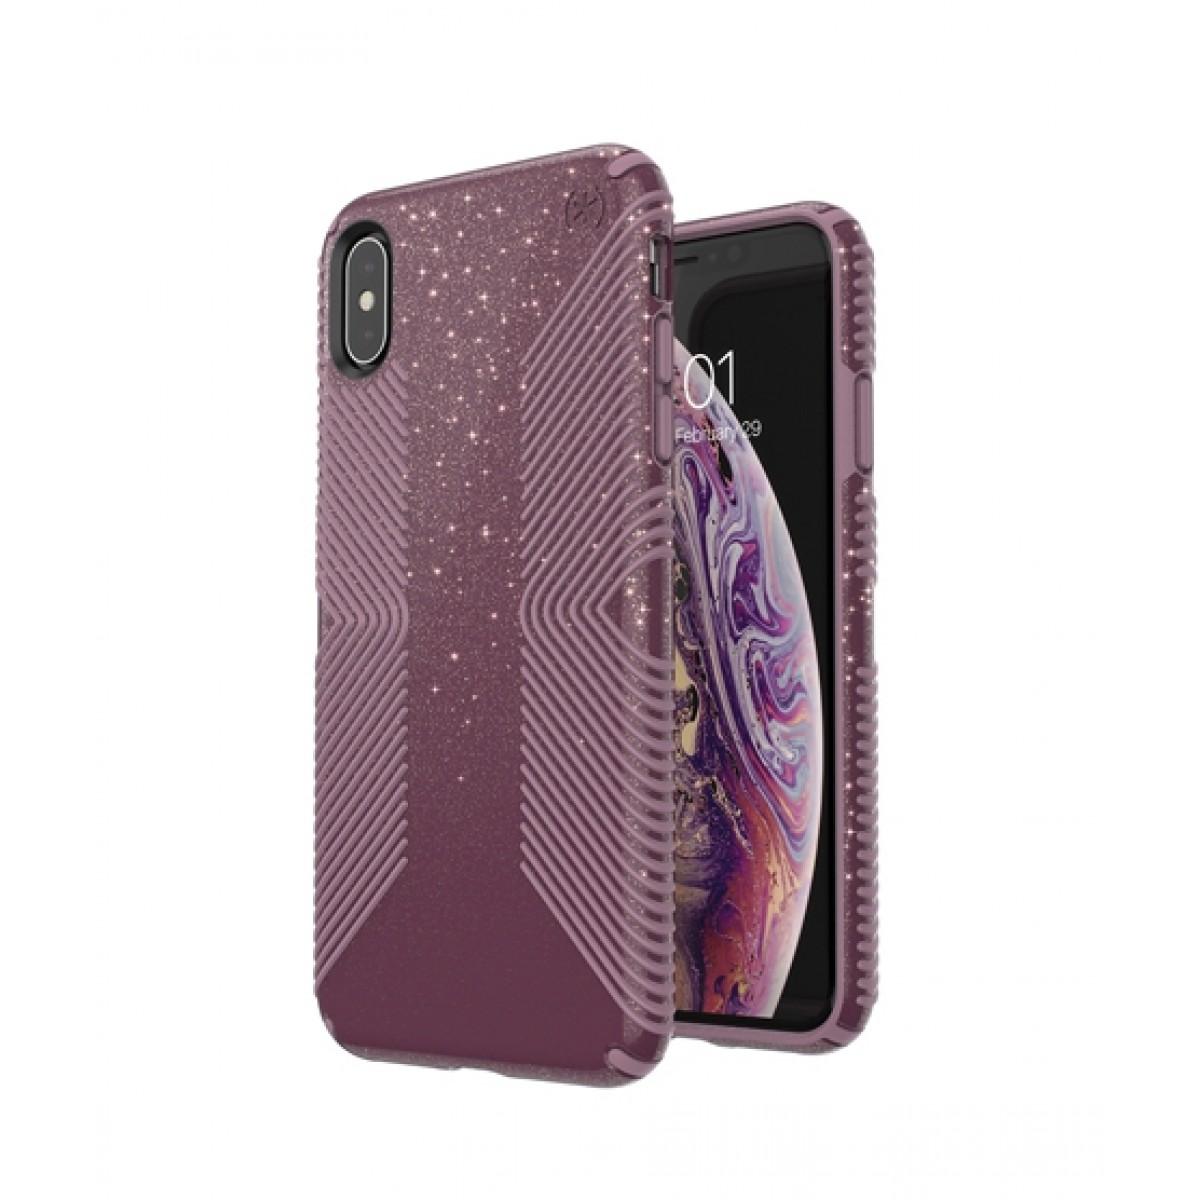 wholesale dealer cd283 7bba9 Speck Presidio Grip + Glitter Starlit Purple/Cattleya Pink Case For iPhone  XS Max